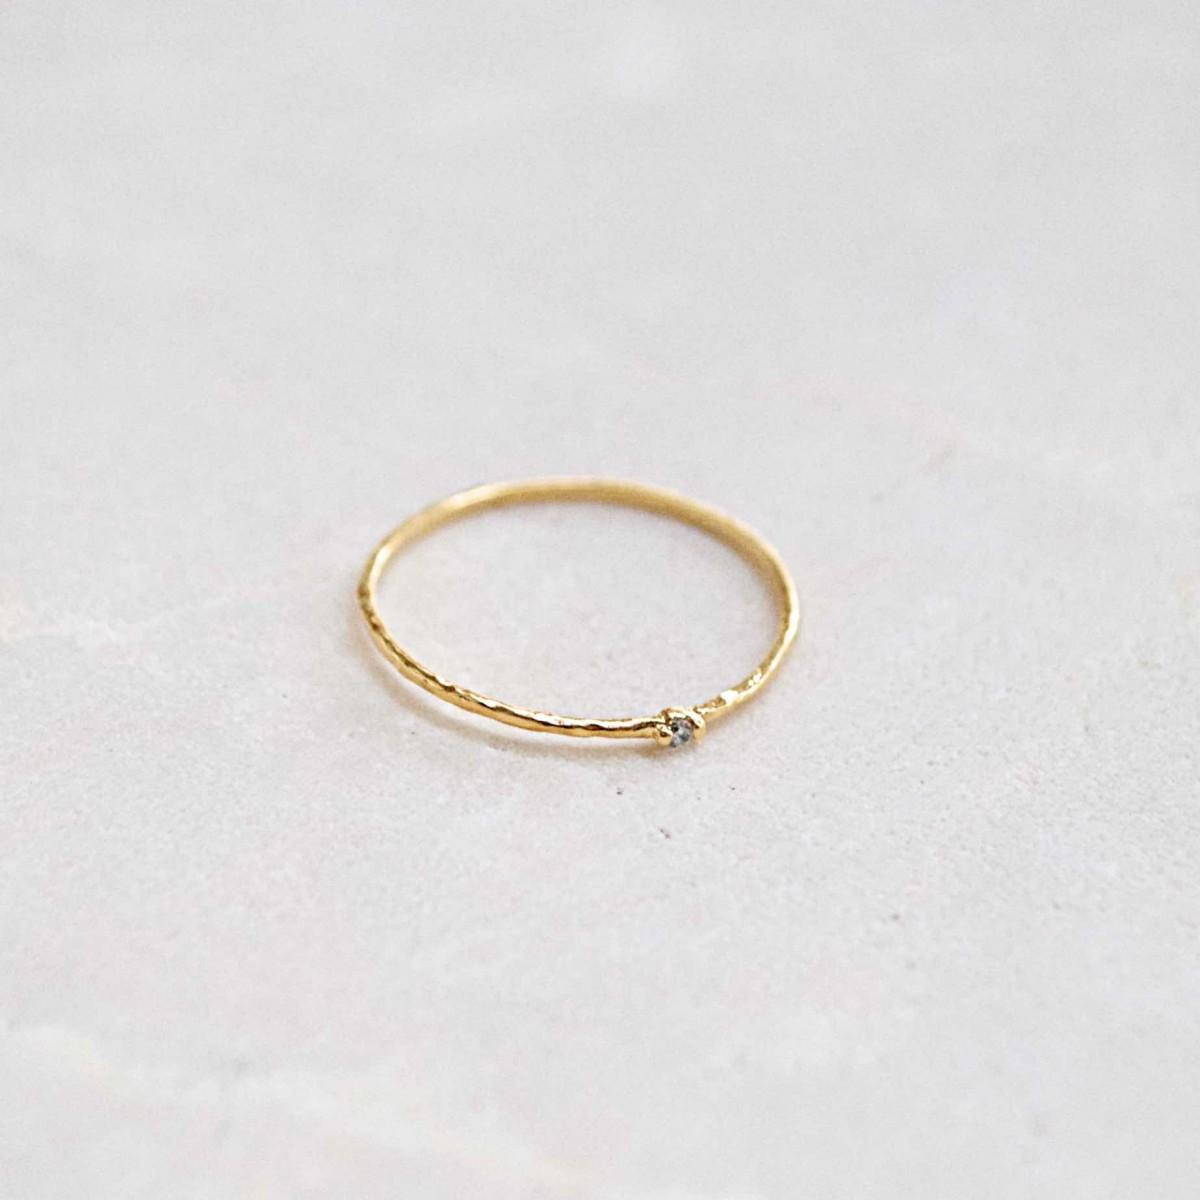 iloveblossom EYES THAT SPARKLE RING // gold